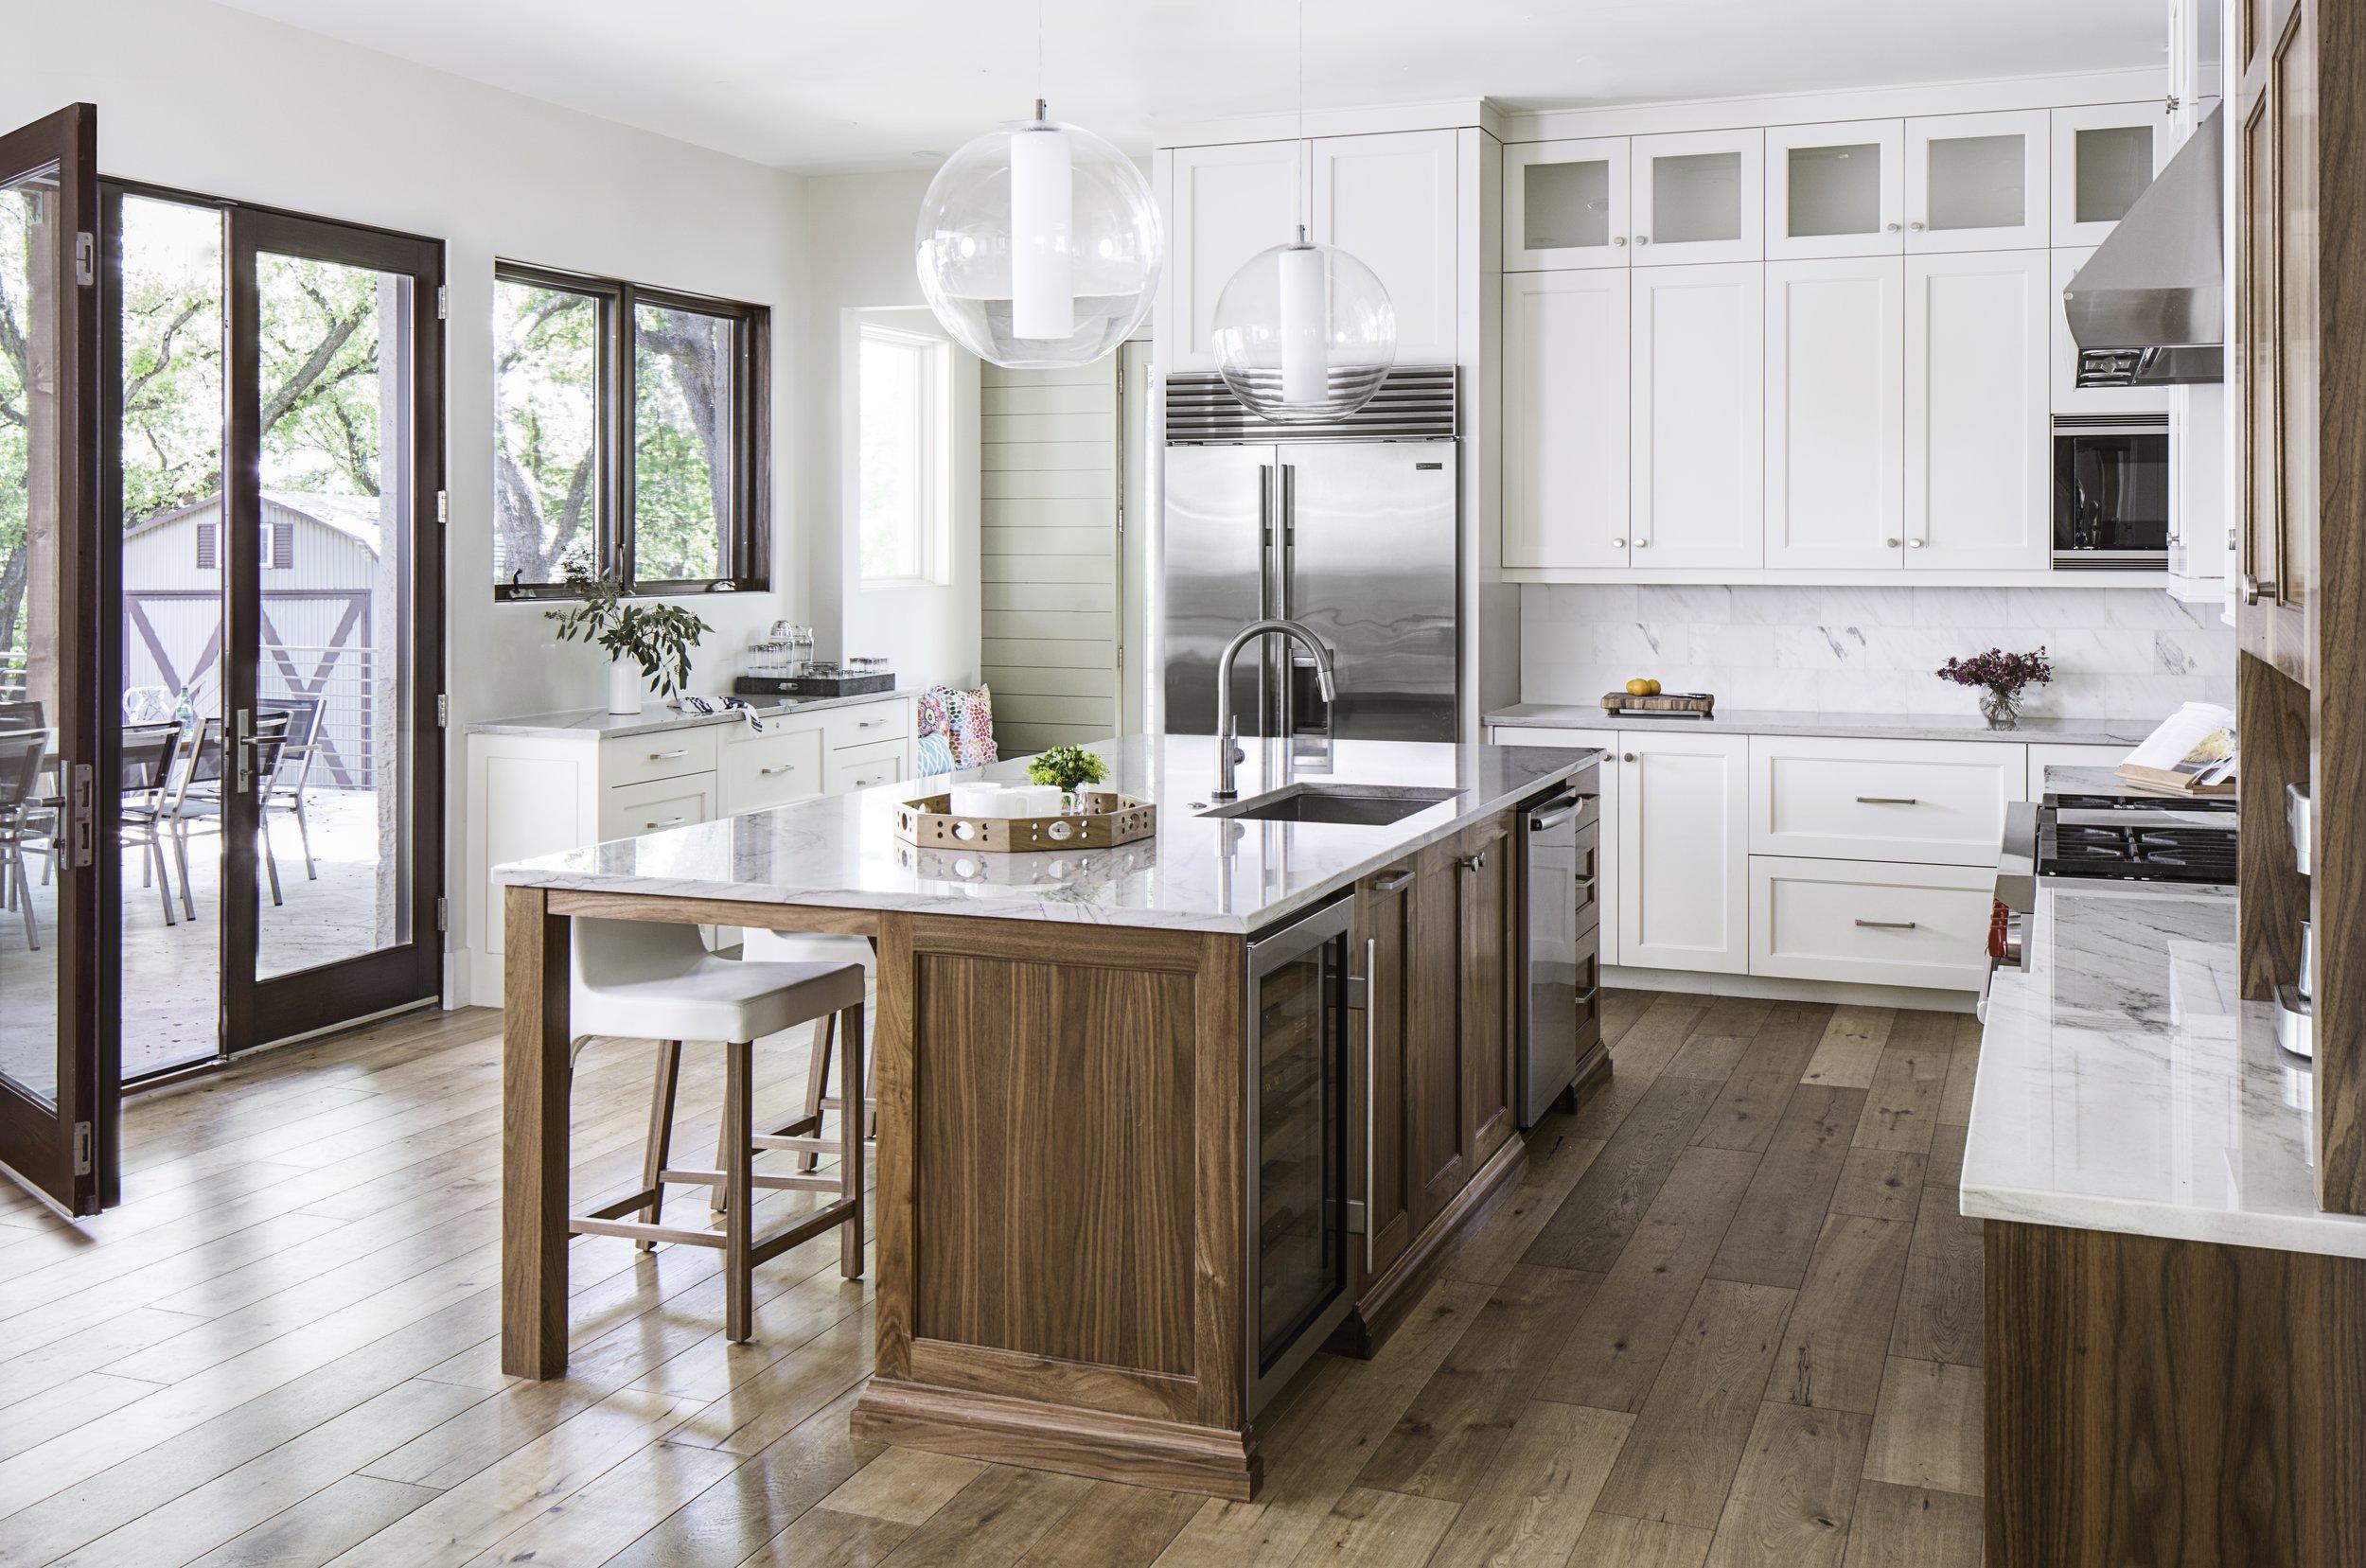 kitchenpatio05-Edit-Edit-Edit-Edit.jpg